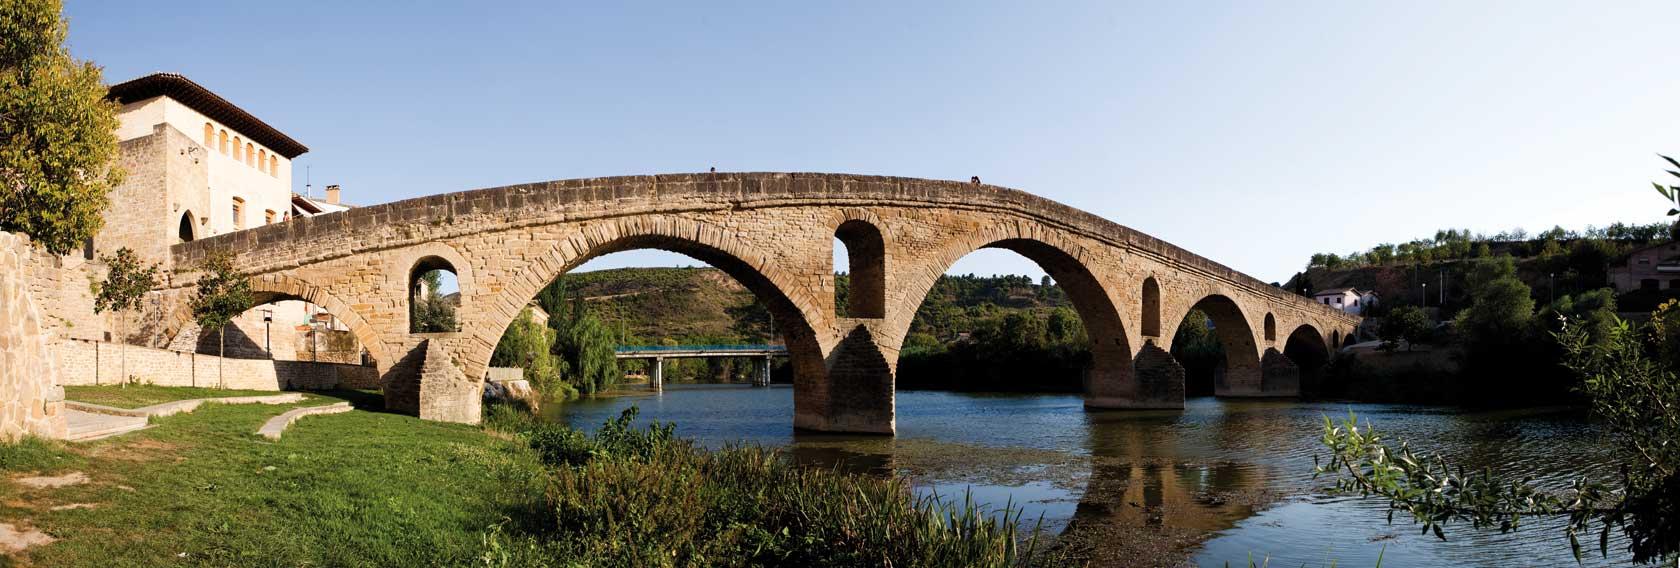 puente la reina xacopedia